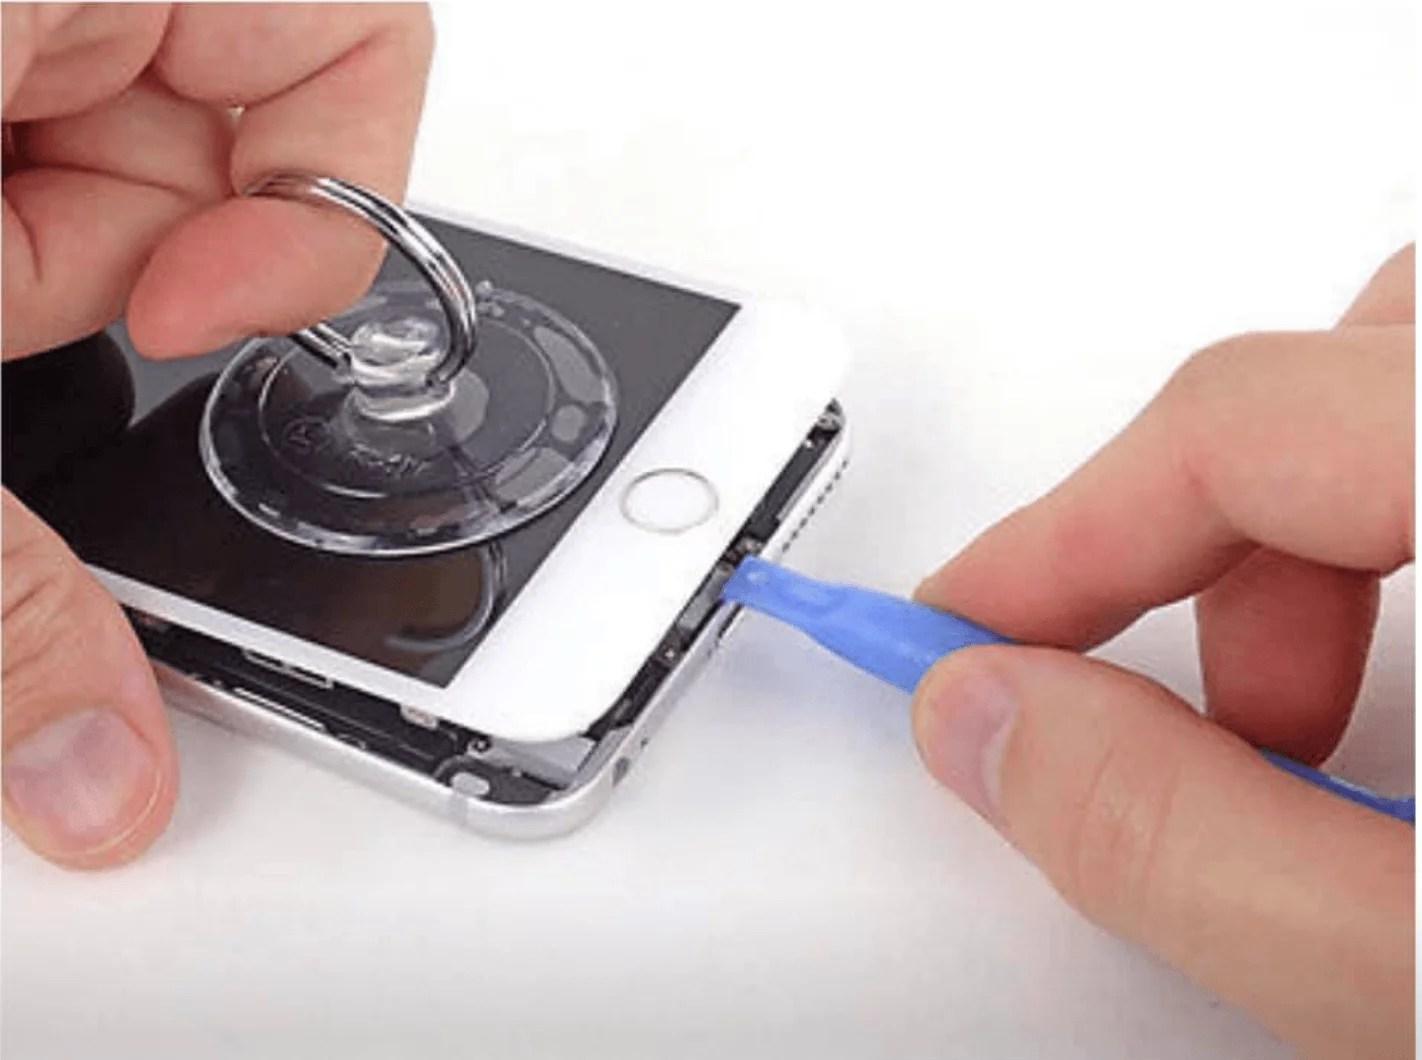 Cheap iphone screen repair in saskatoon